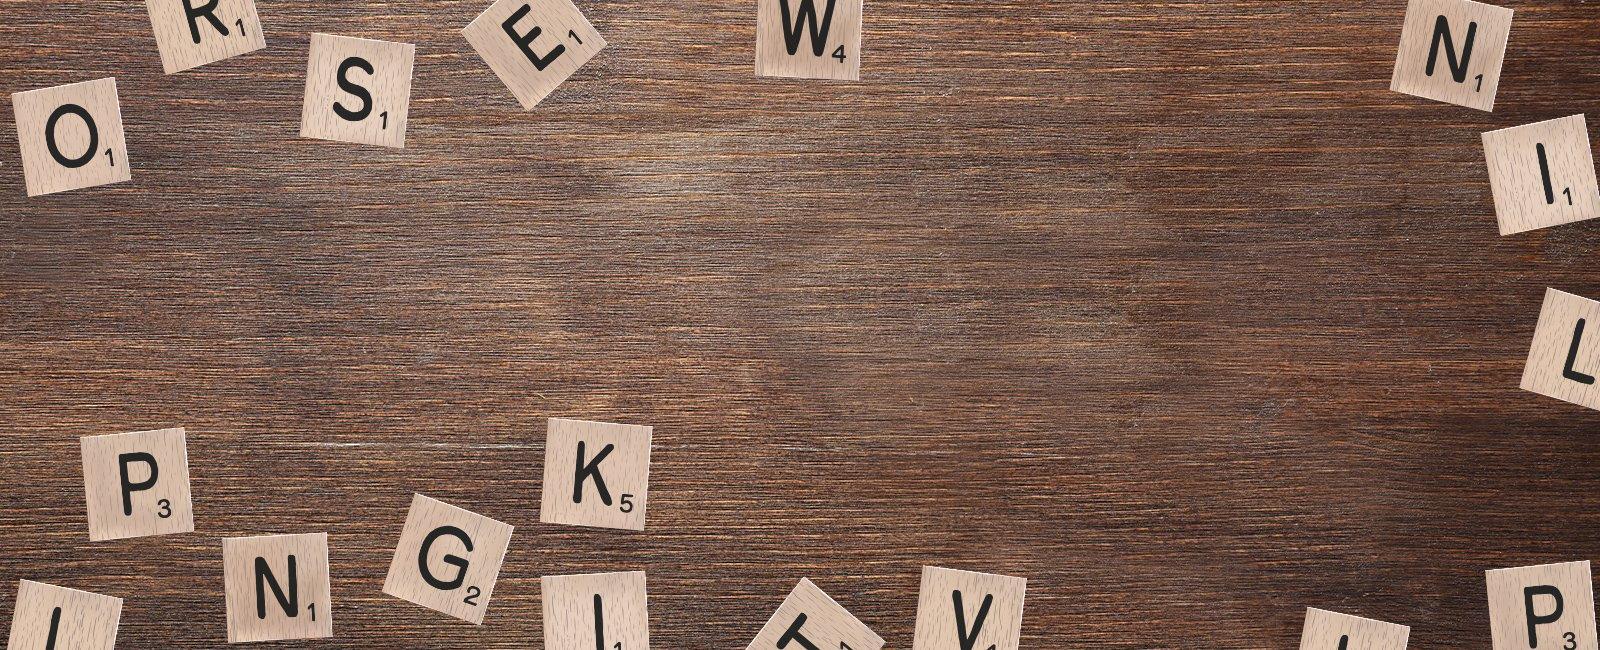 lp-Keywords_for_SEO_SEA